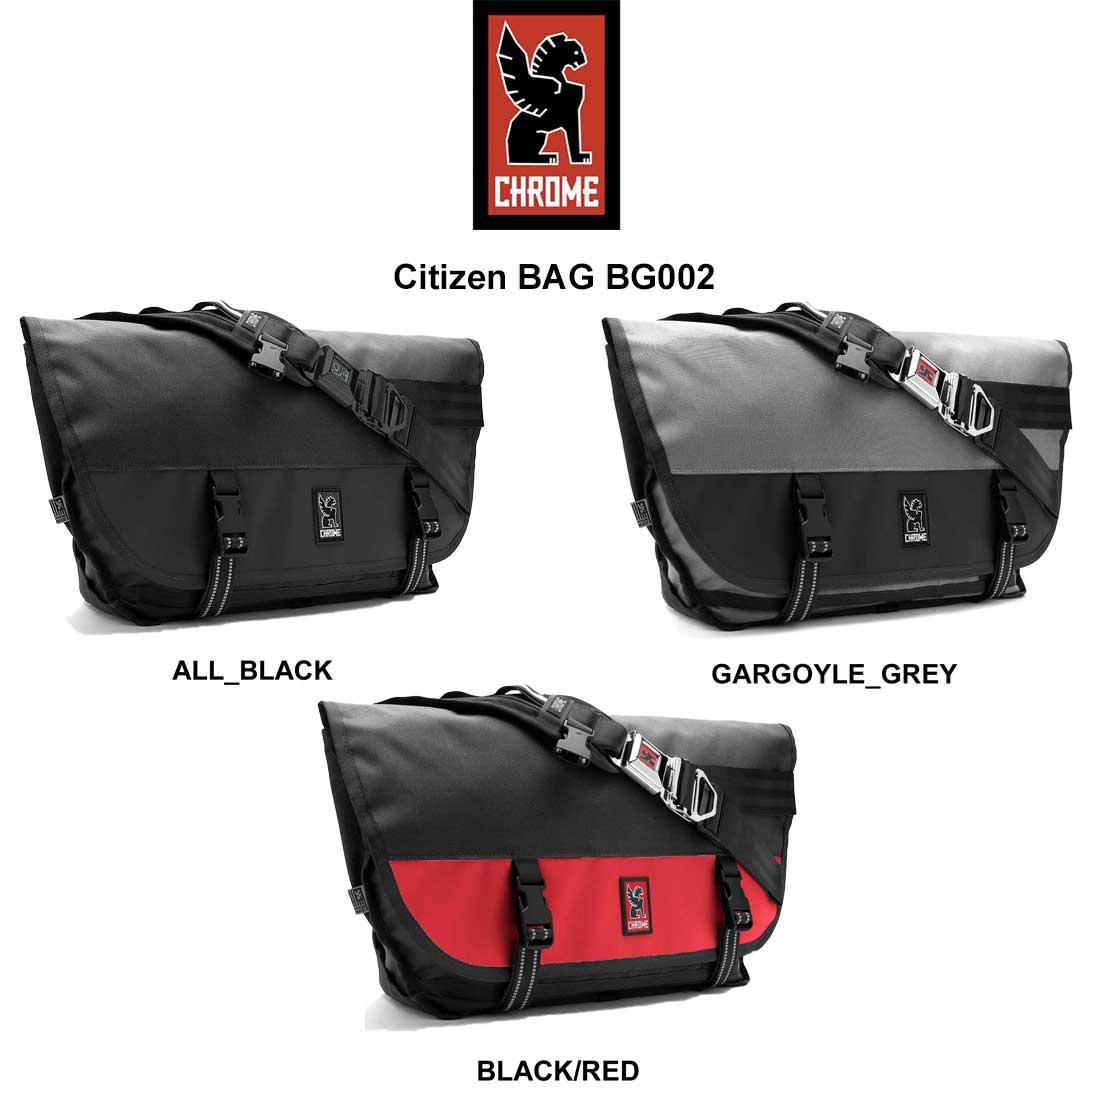 Chrome(クローム)シチズン メッセンジャーバッグ サイクリング 自転車 ロードバイク Citizen BAG BG002